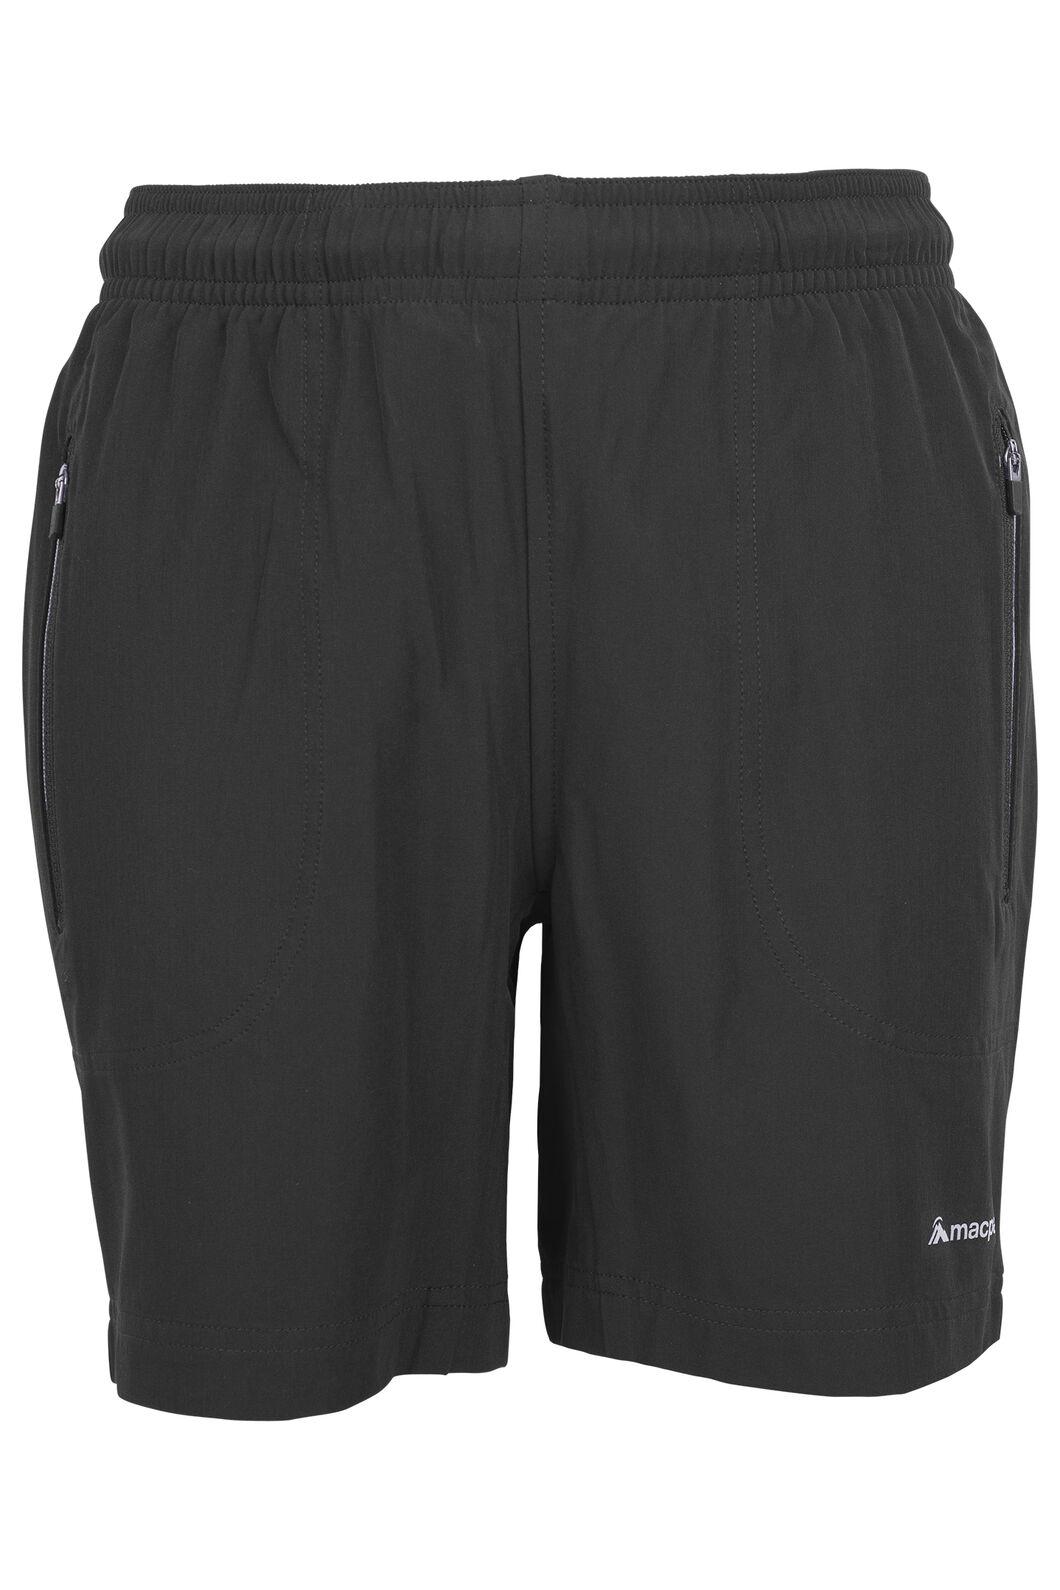 Macpac Fast Track Shorts - Kids', Black, hi-res